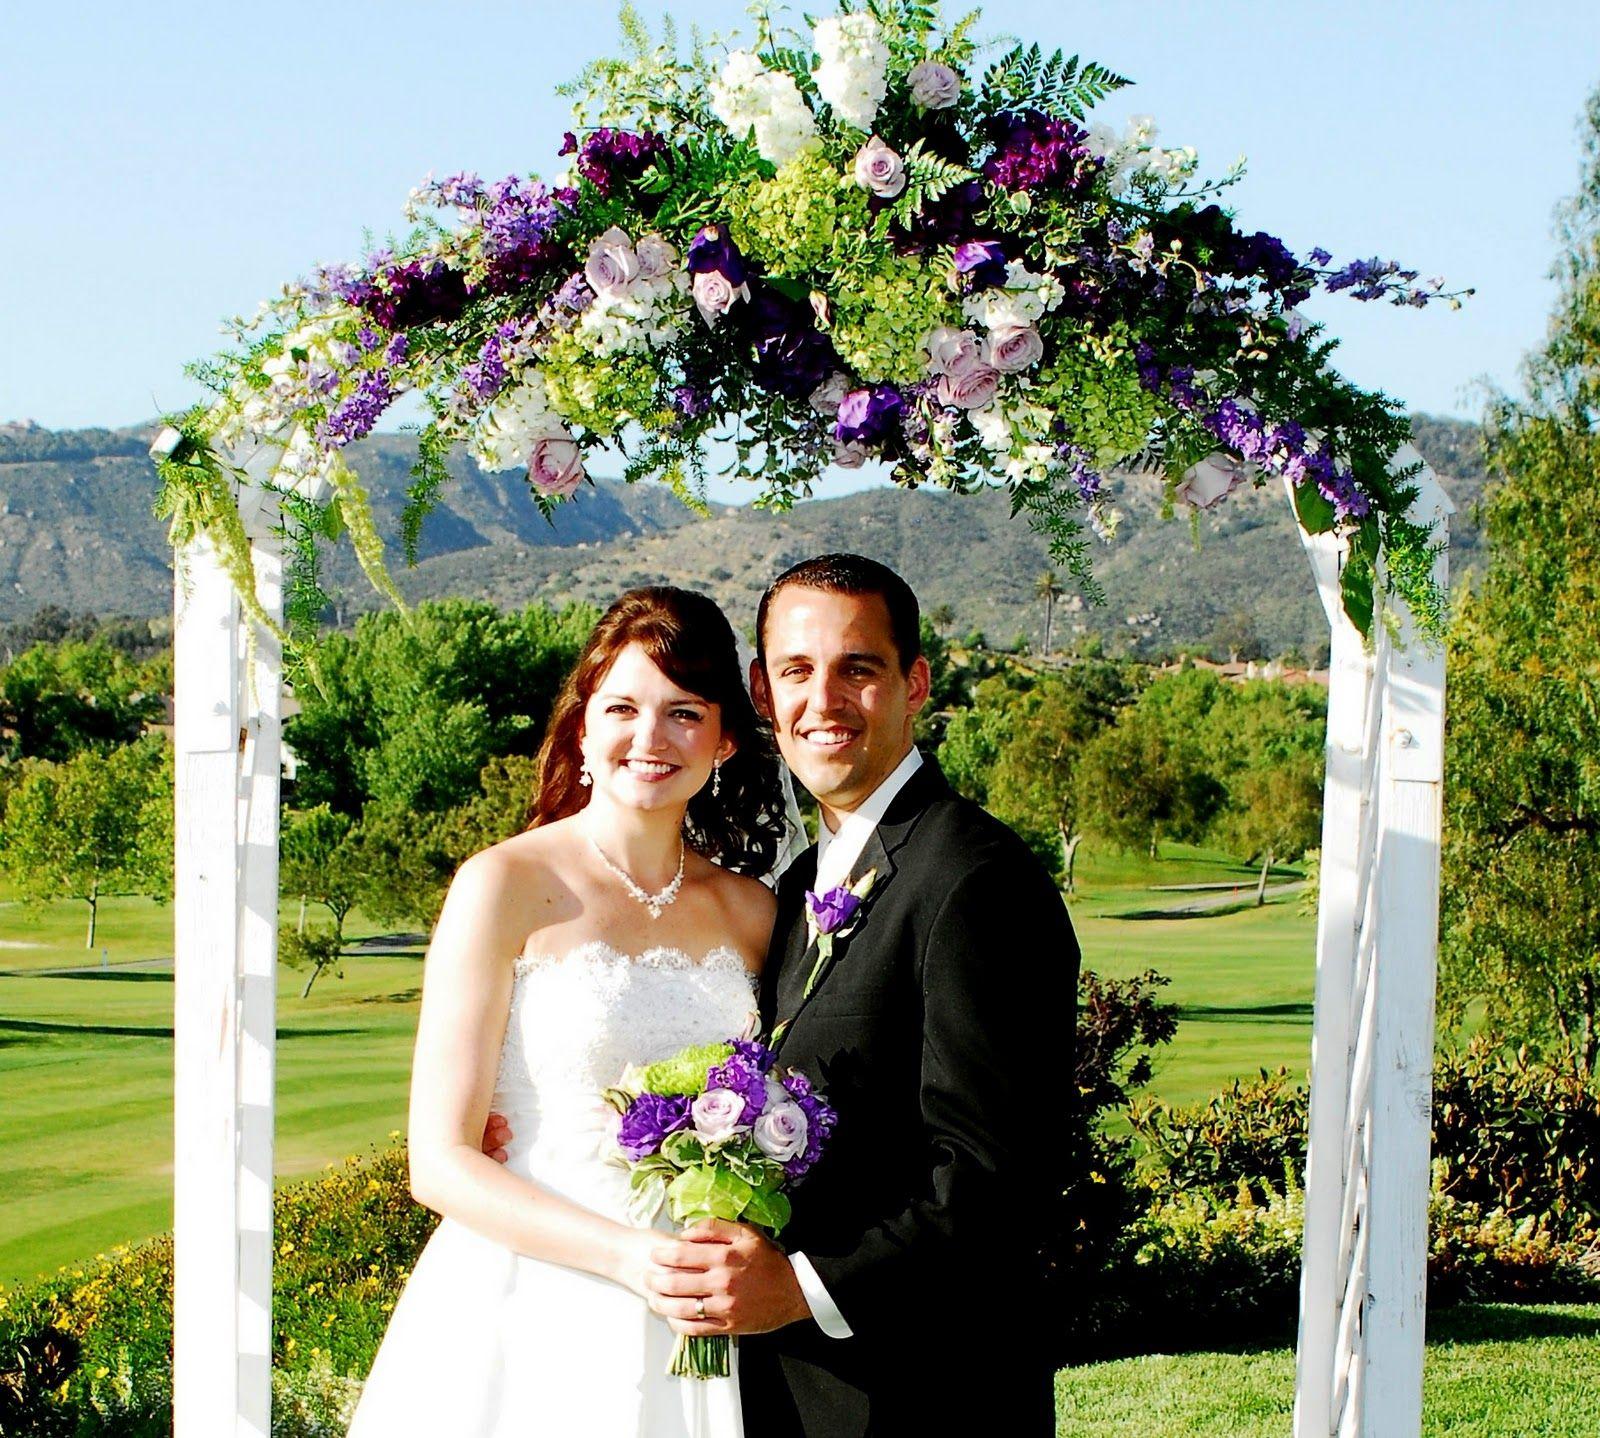 Purple And Green Wedding Ideas: ... Eggplant Purple And Lime